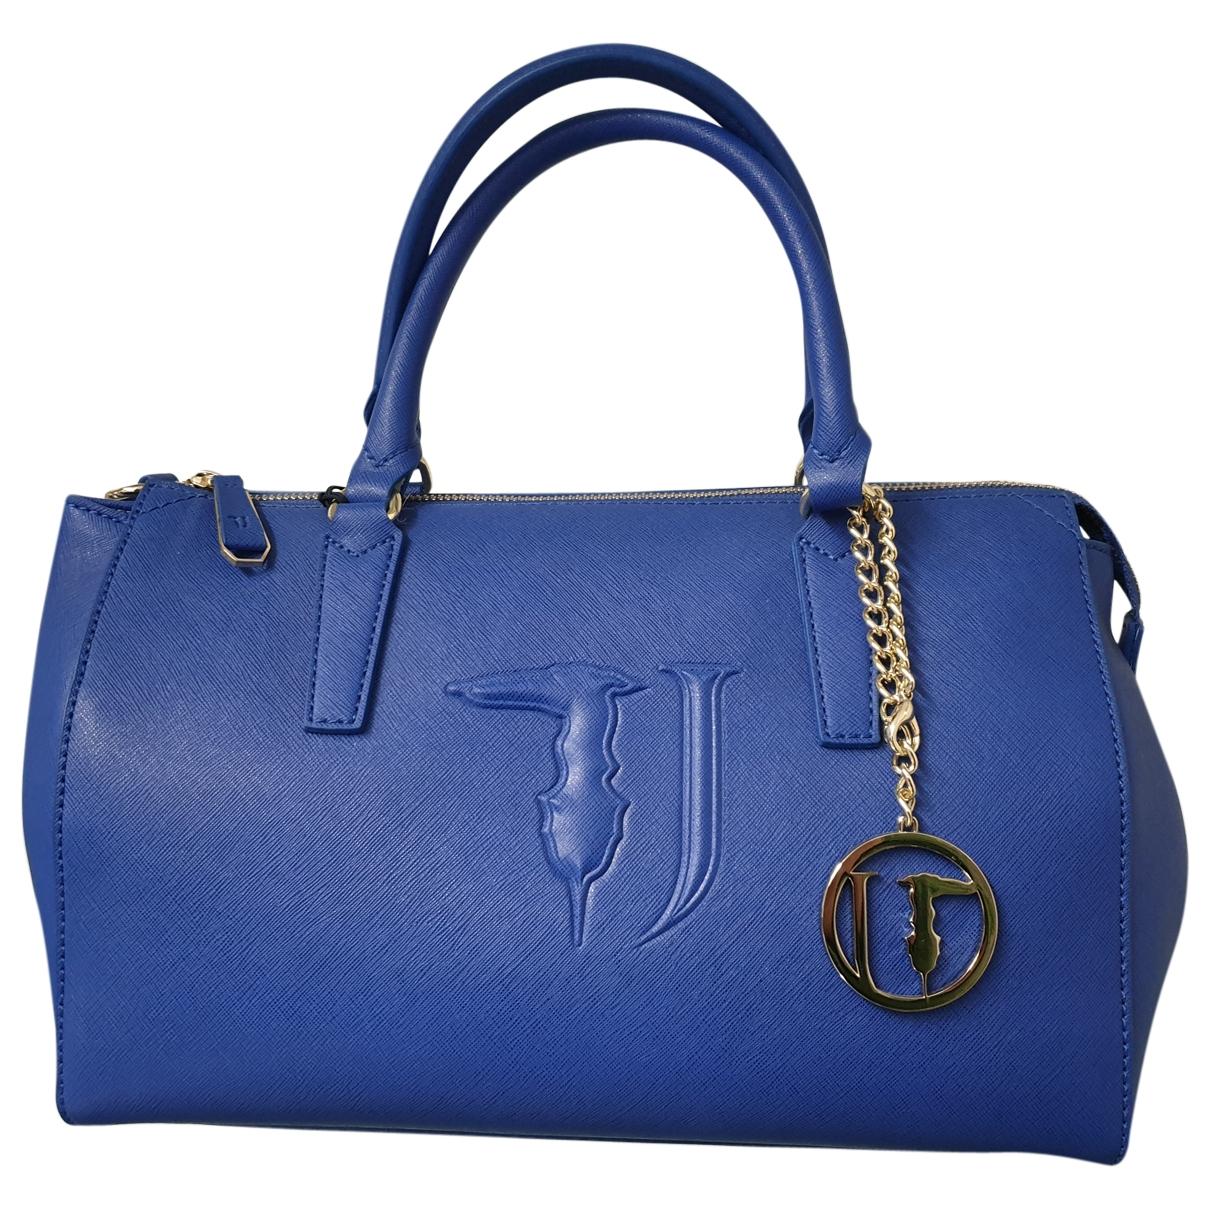 Trussardi Jeans \N Handtasche in  Blau Leder